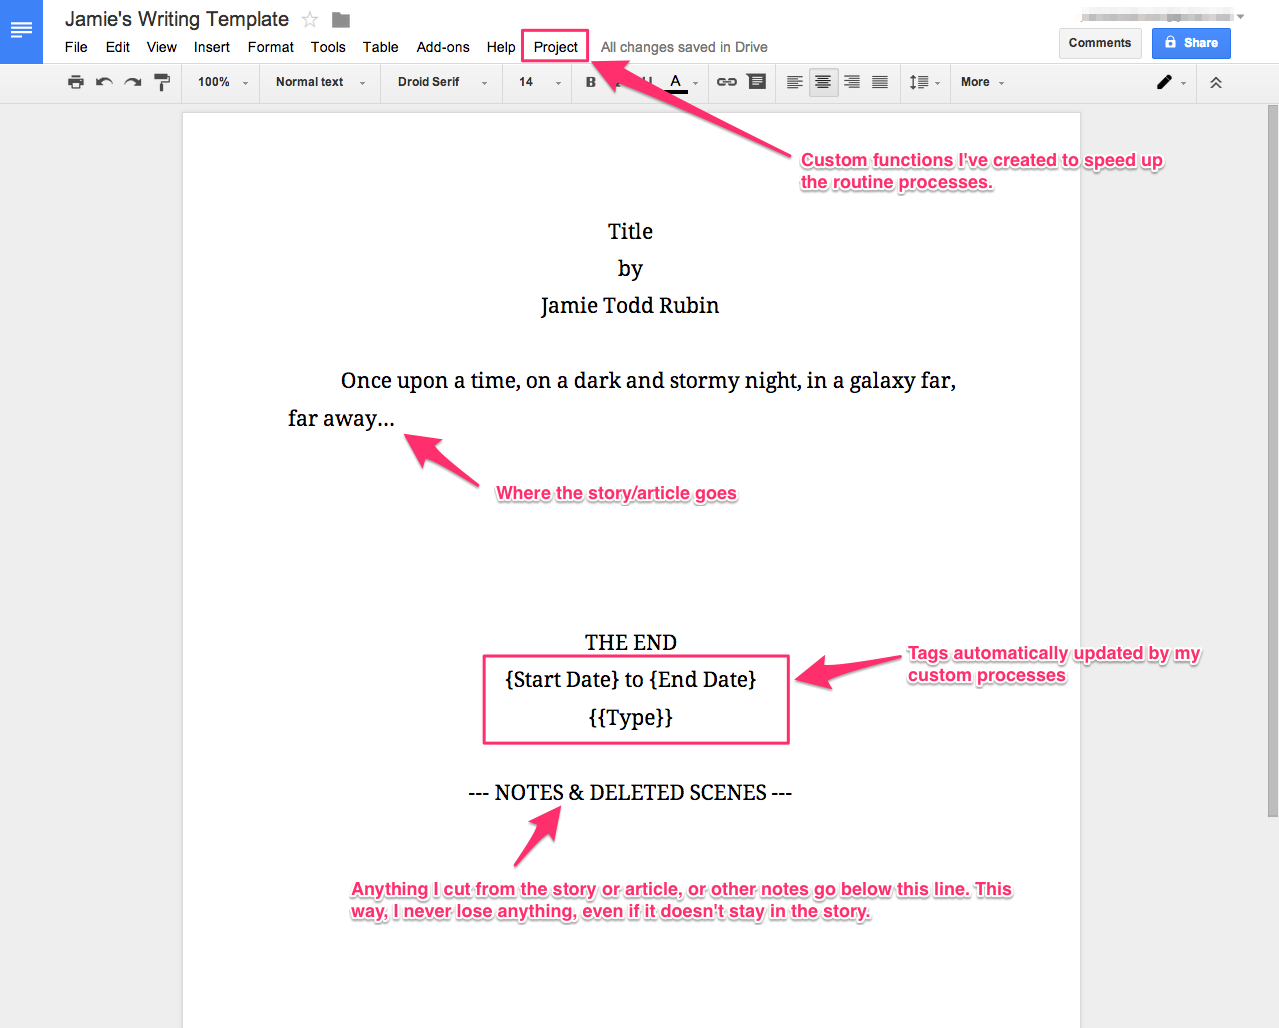 Google Docs Template | Jamie Todd Rubin inside Google Docs